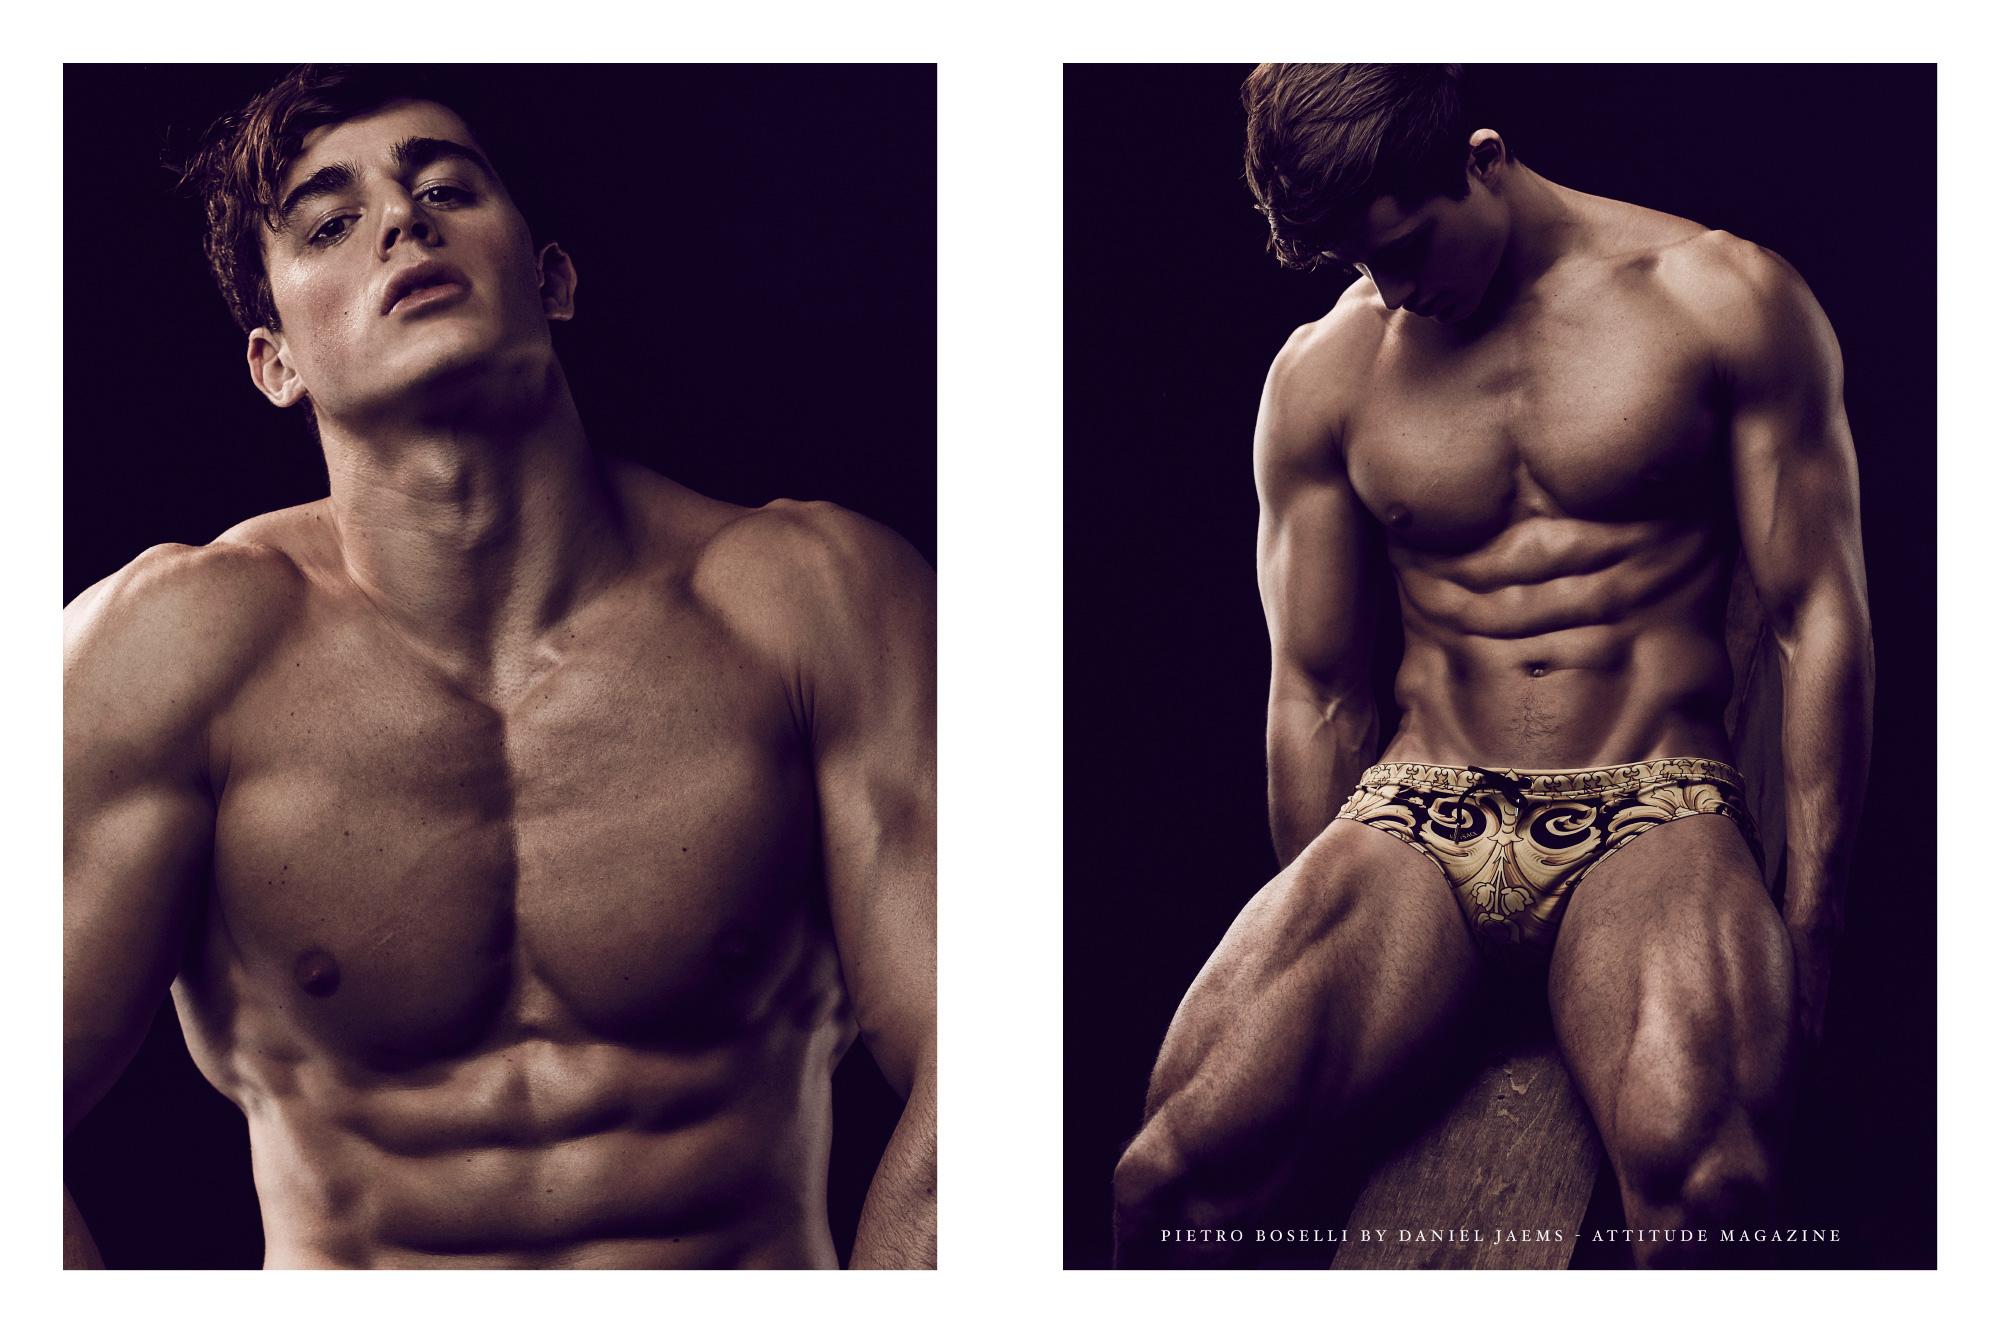 Pietro-Boselli-by-Daniel-Jaems-for-Attitude-Magazine-12